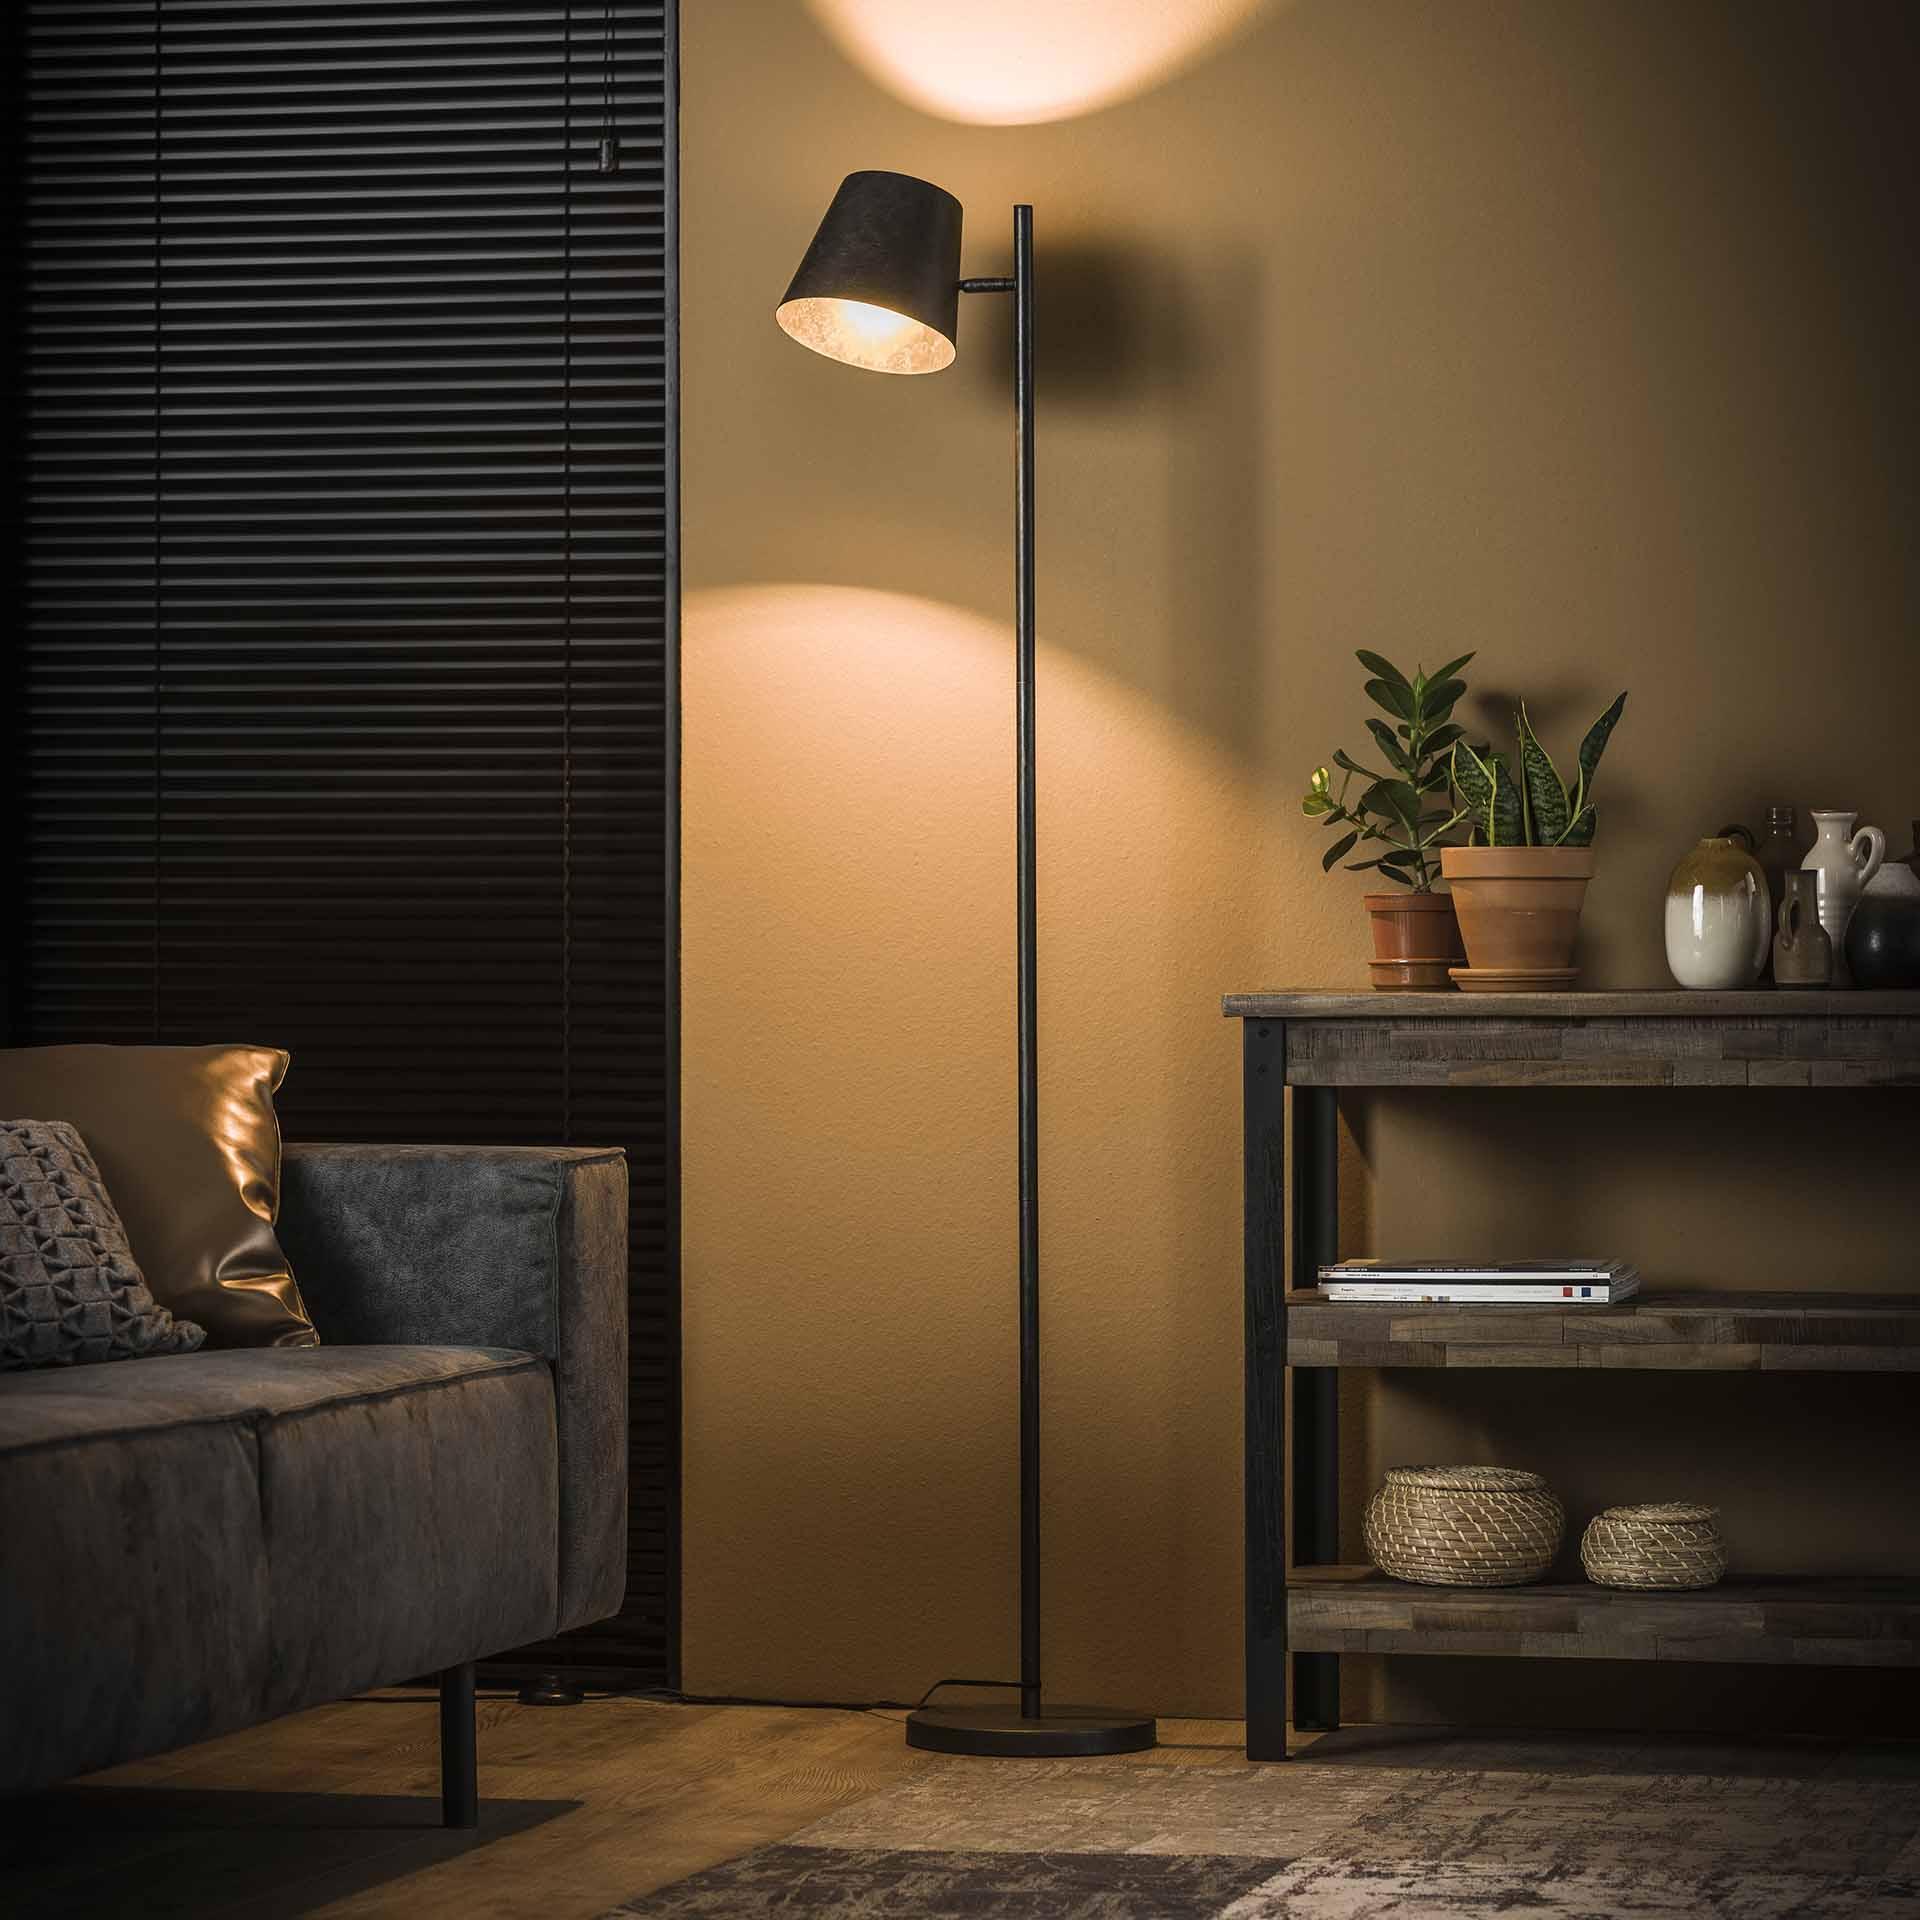 Vloerlamp 1L verstelbare metalen kap - Charcoal